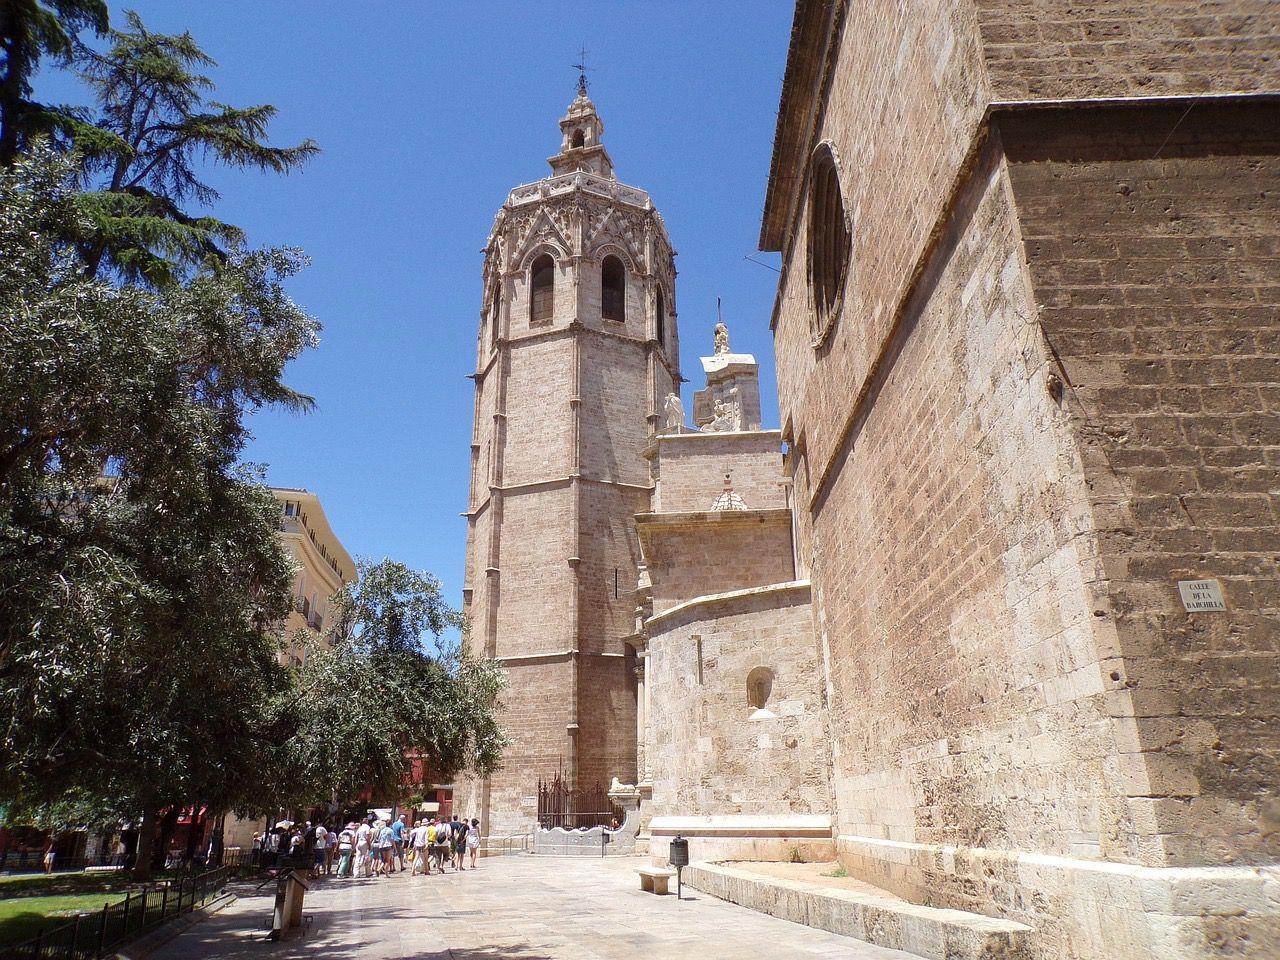 Old Town of Valencia: Sightseeing Audio Tour